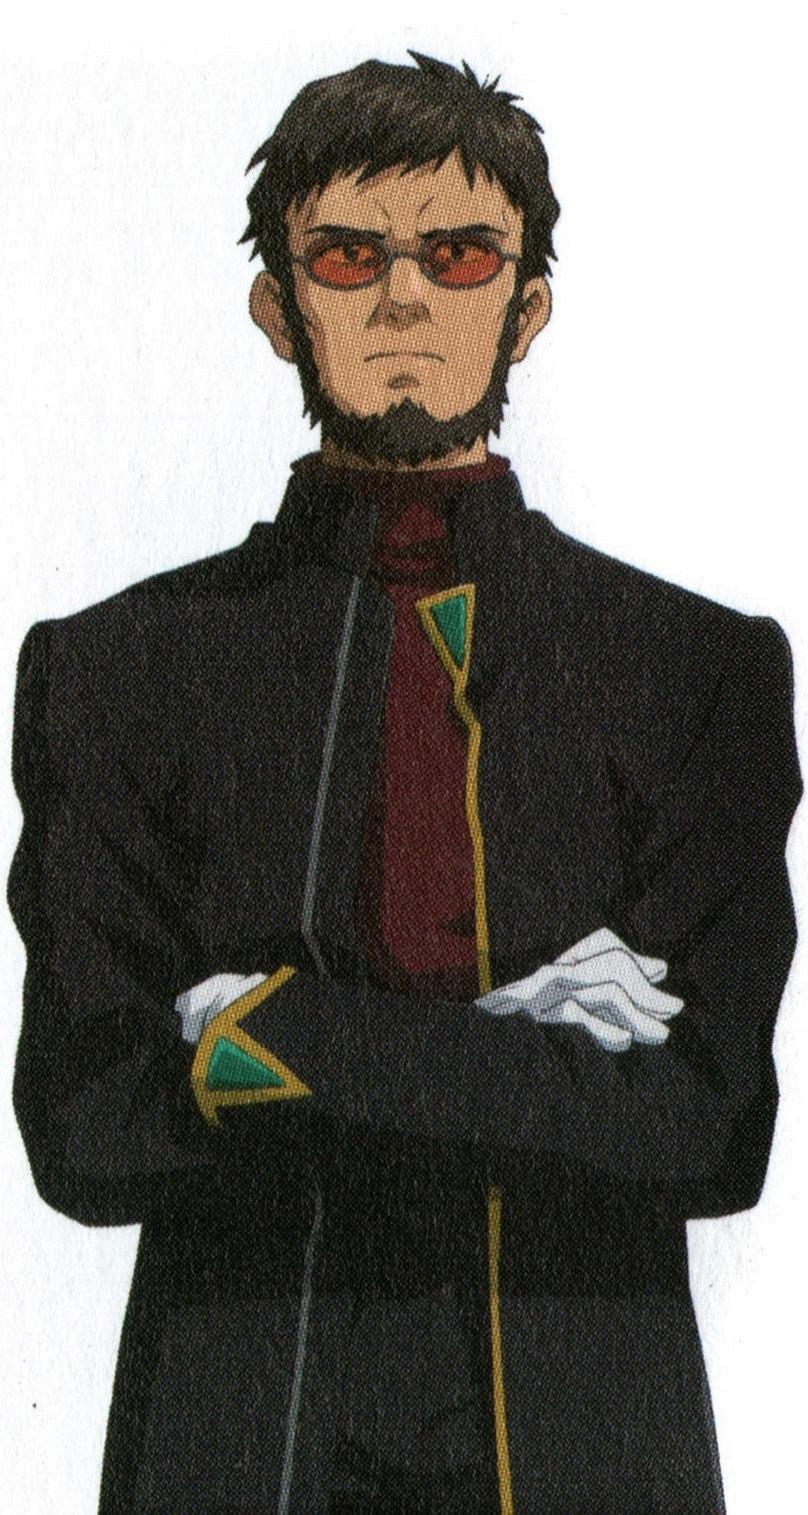 Gendō Ikari